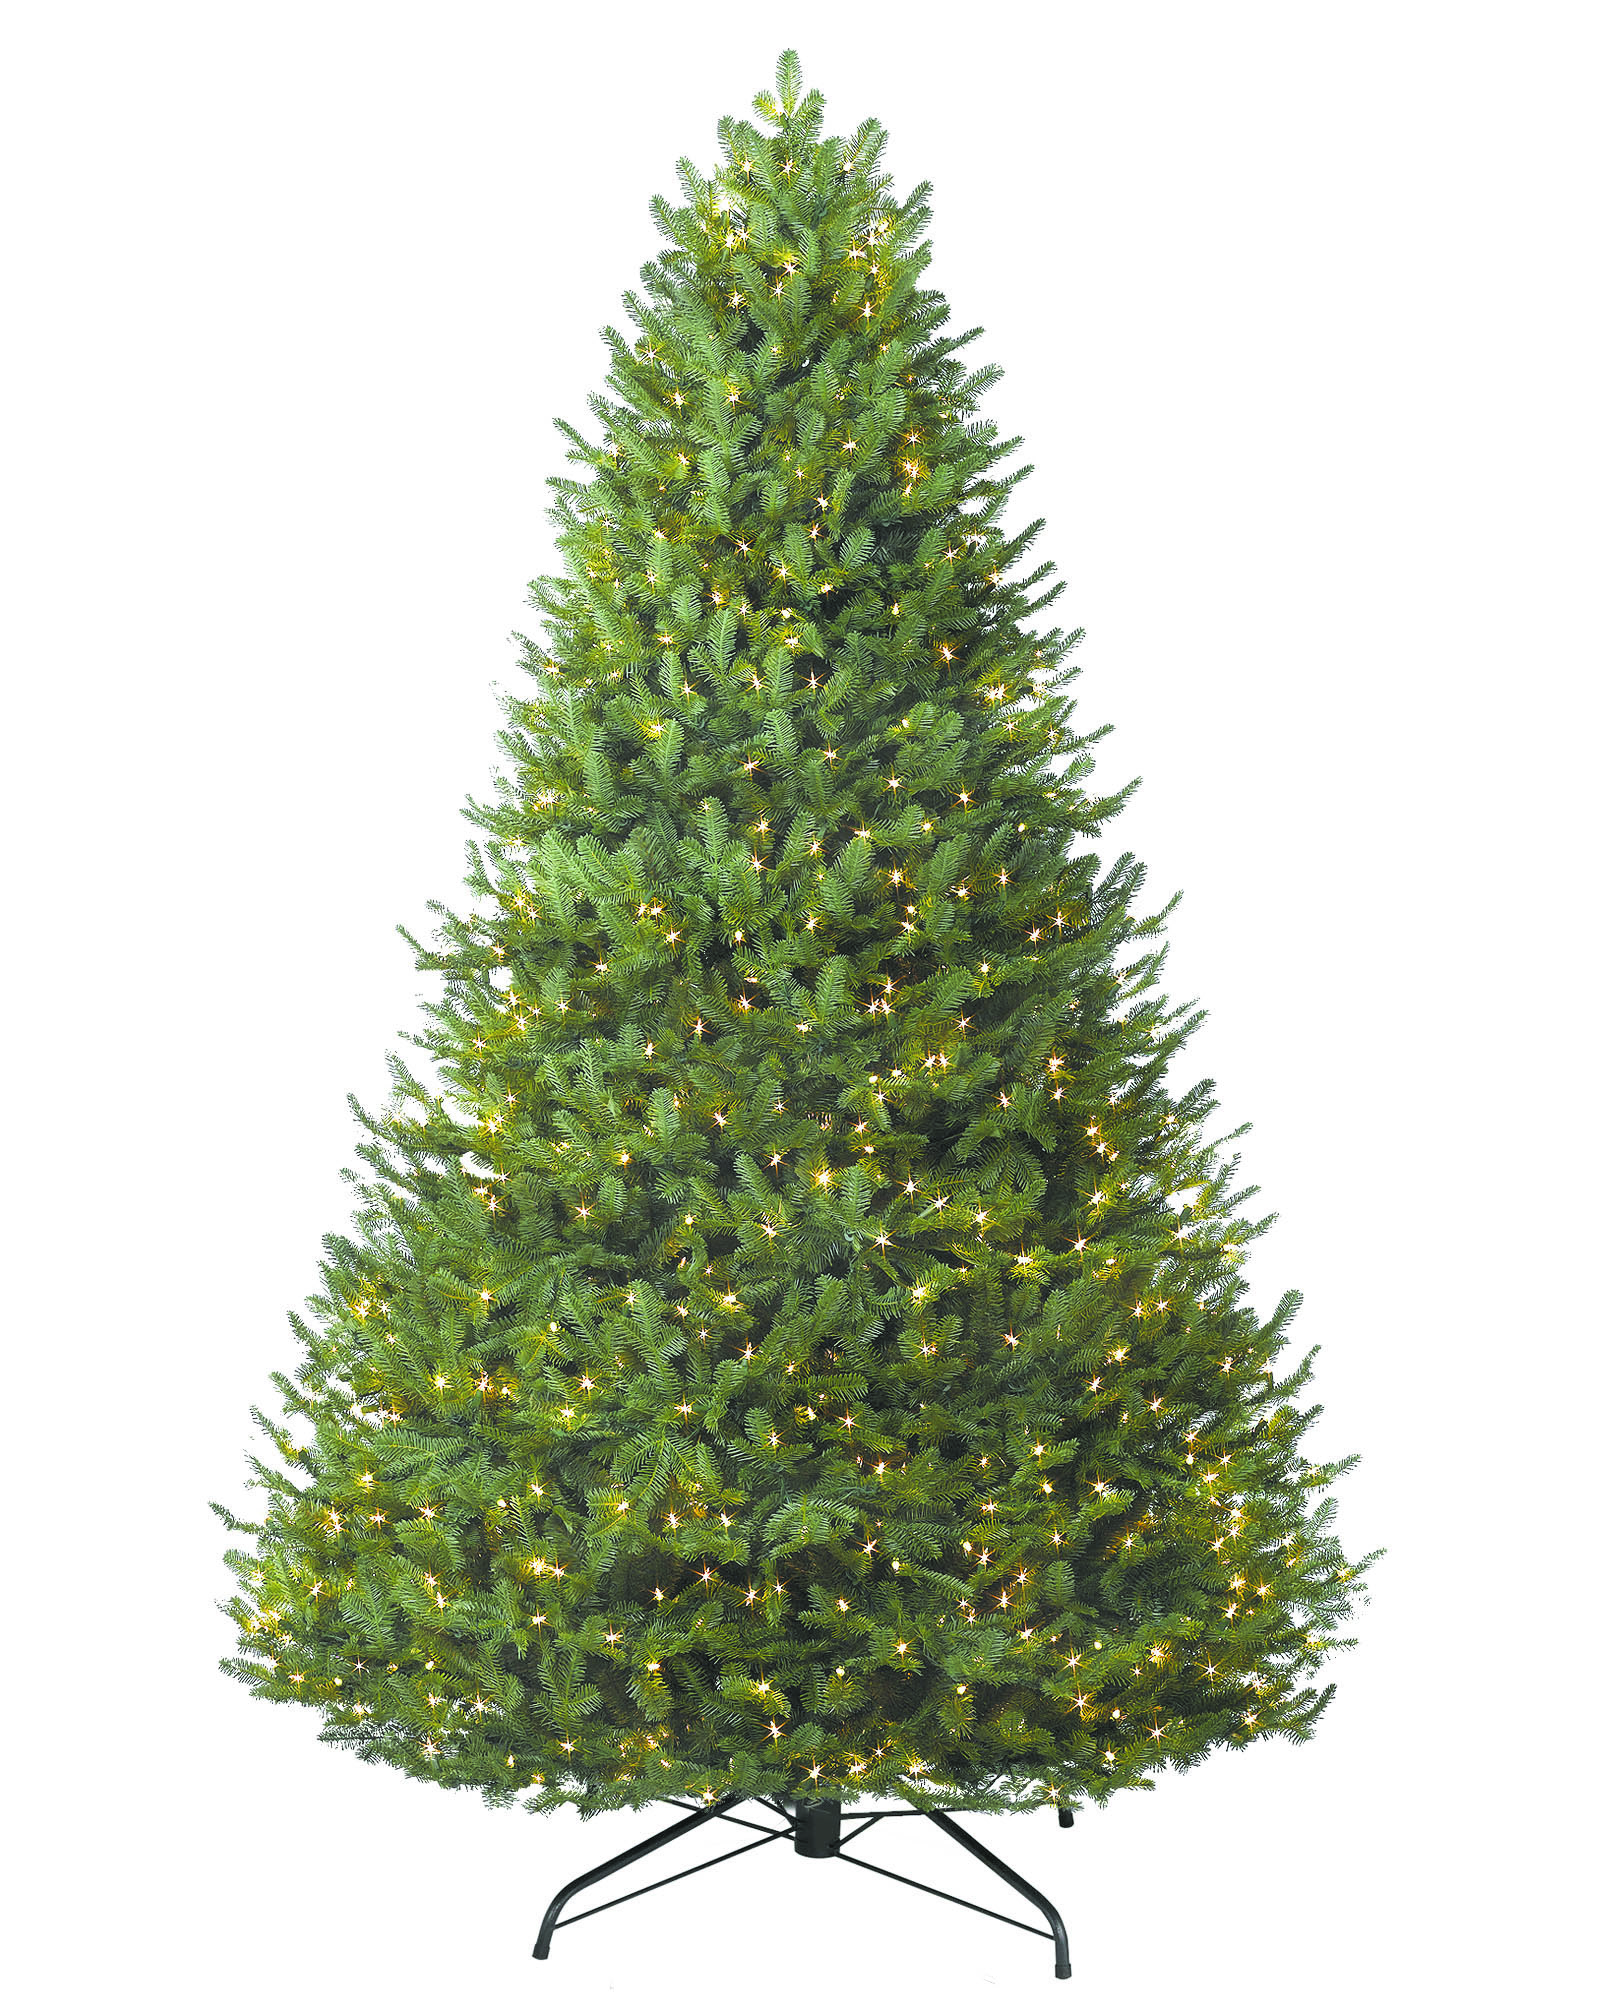 ChristmasTreeTips_121416A